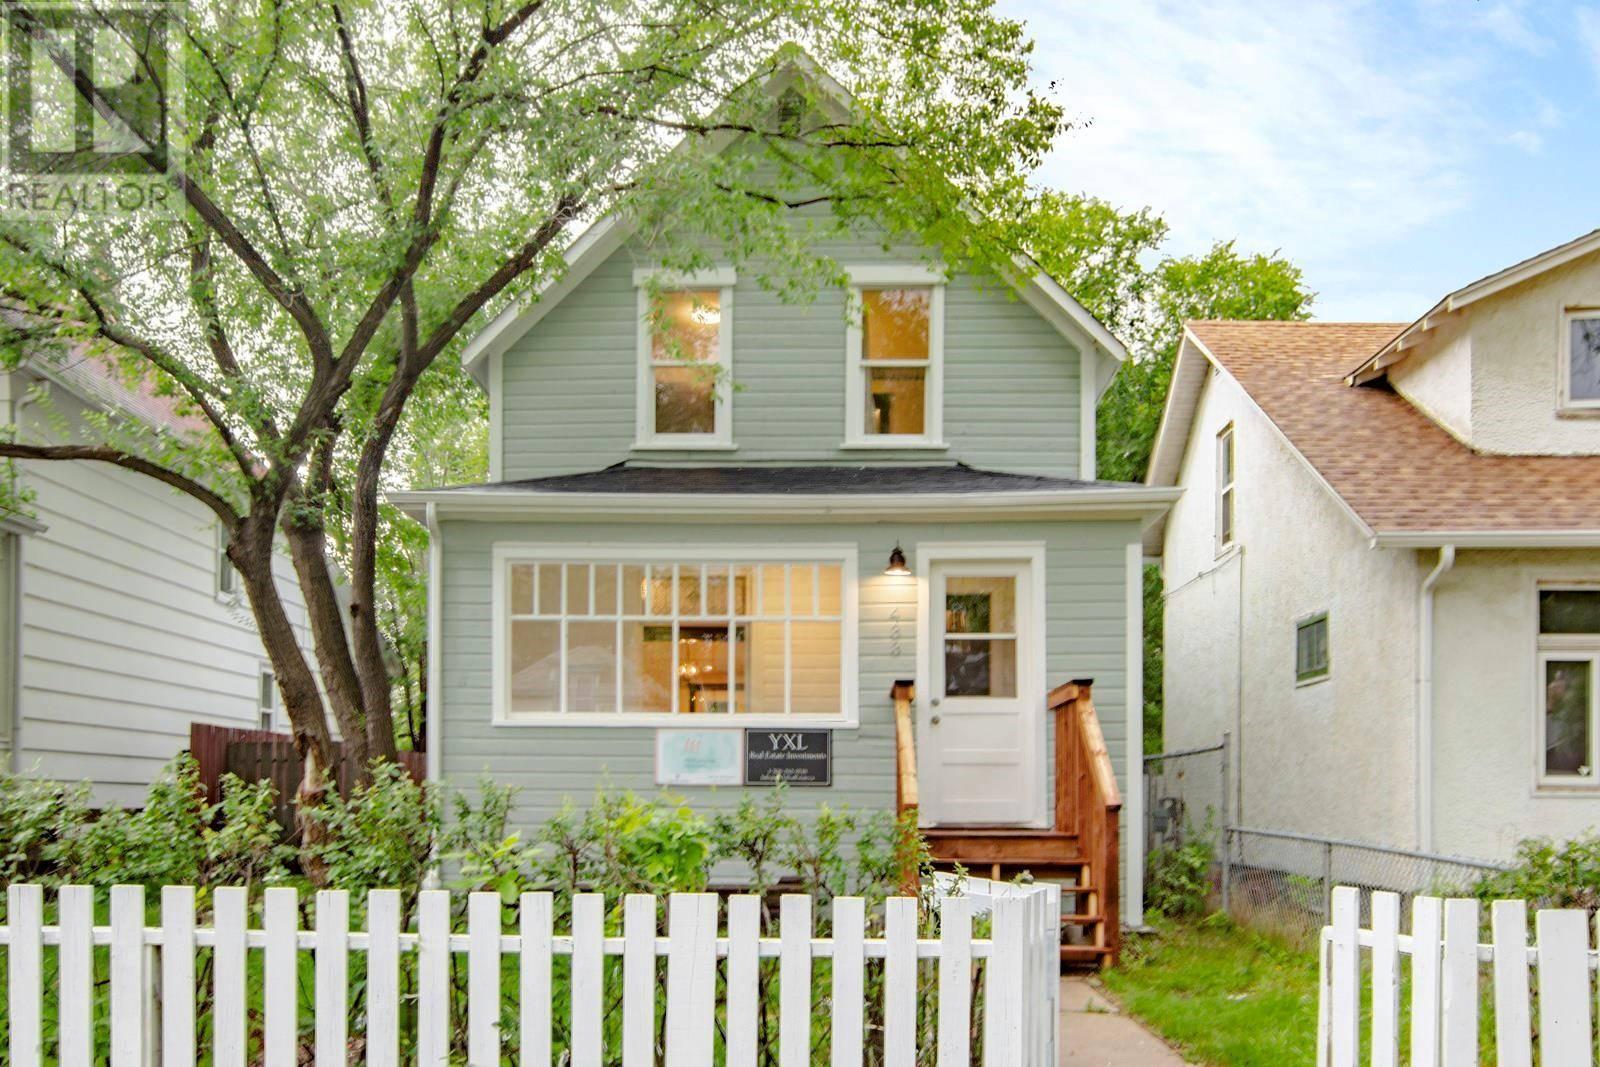 House for sale at 433 H Ave S Saskatoon Saskatchewan - MLS: SK783241